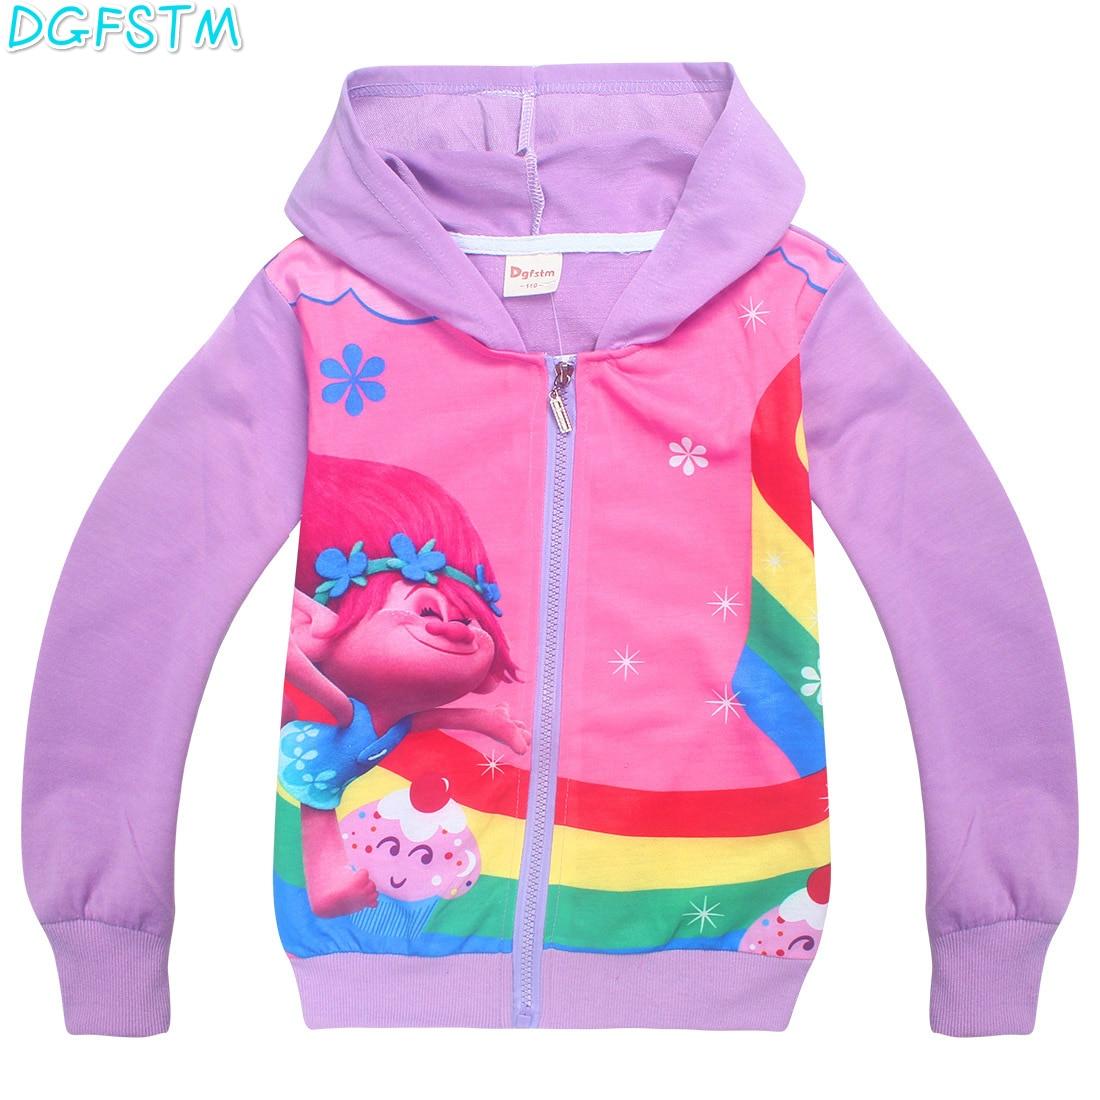 Boy Mona hooded sweater Hoodies Moana Sweatshirts Vaiana Kids Long Sleeve Casual Costume Baby Girl Tops Trolls Outwear T shirt